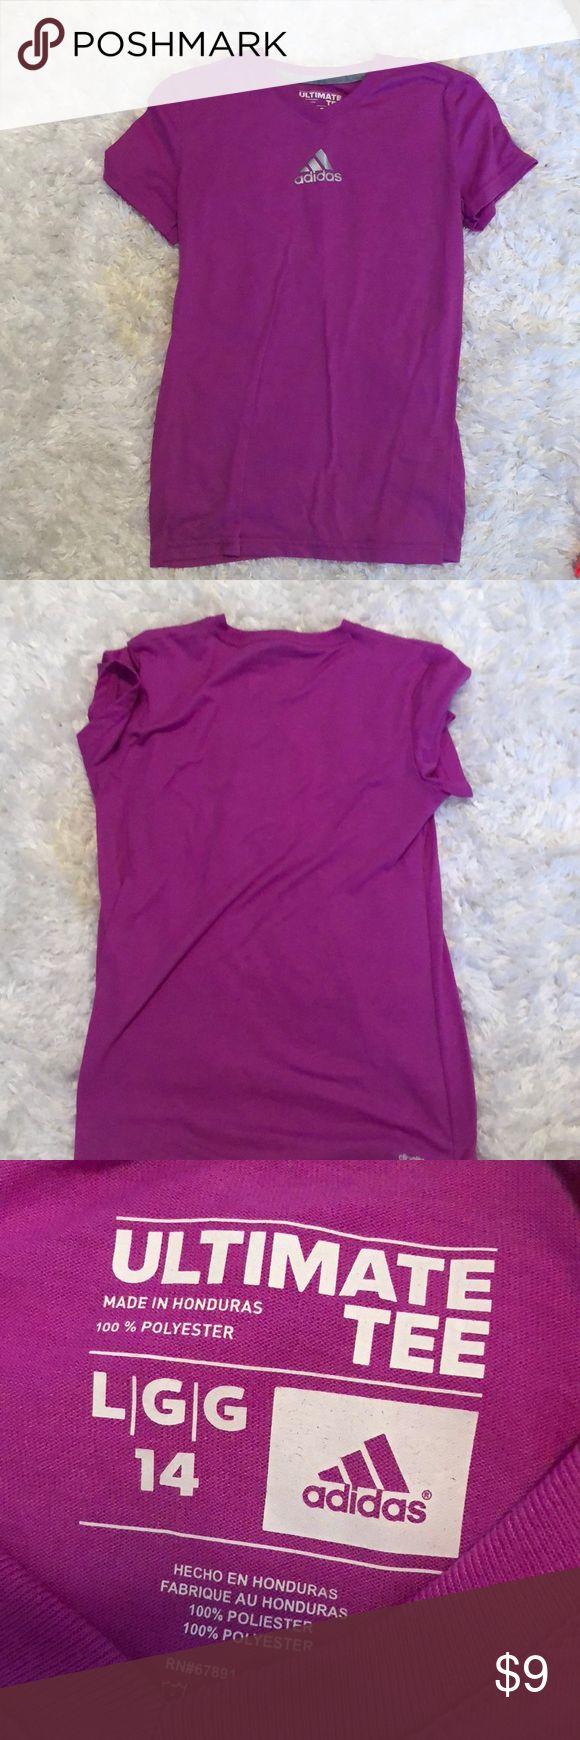 Purple Adidas Ultimate Tee Purple Tee from Adidas, kids large (14), great condition! adidas Shirts & Tops Tees - Short Sleeve